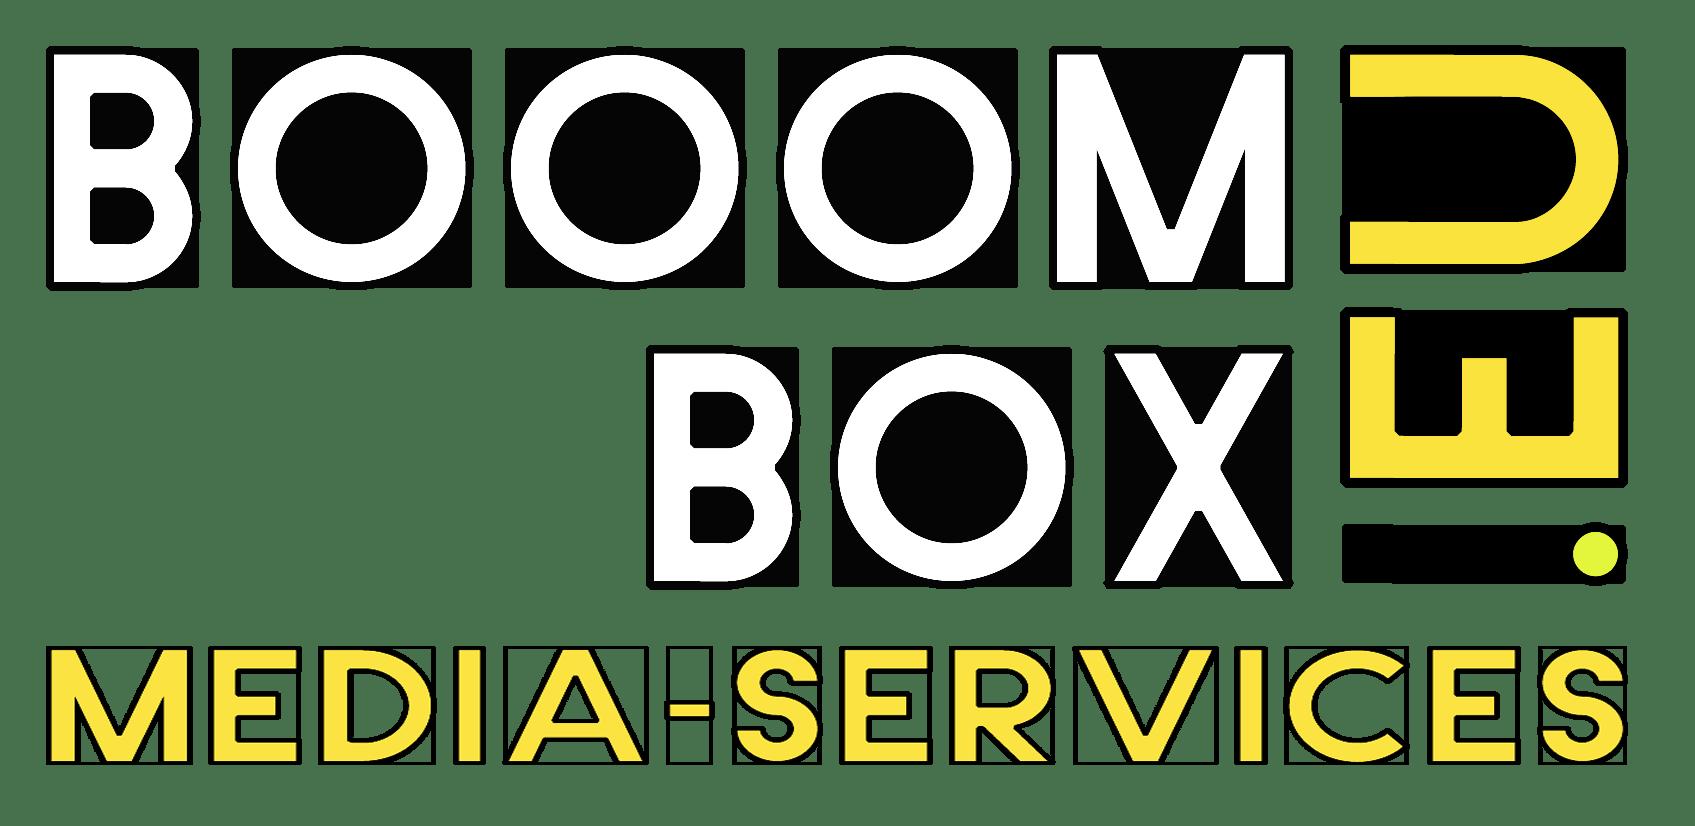 booombox.eu